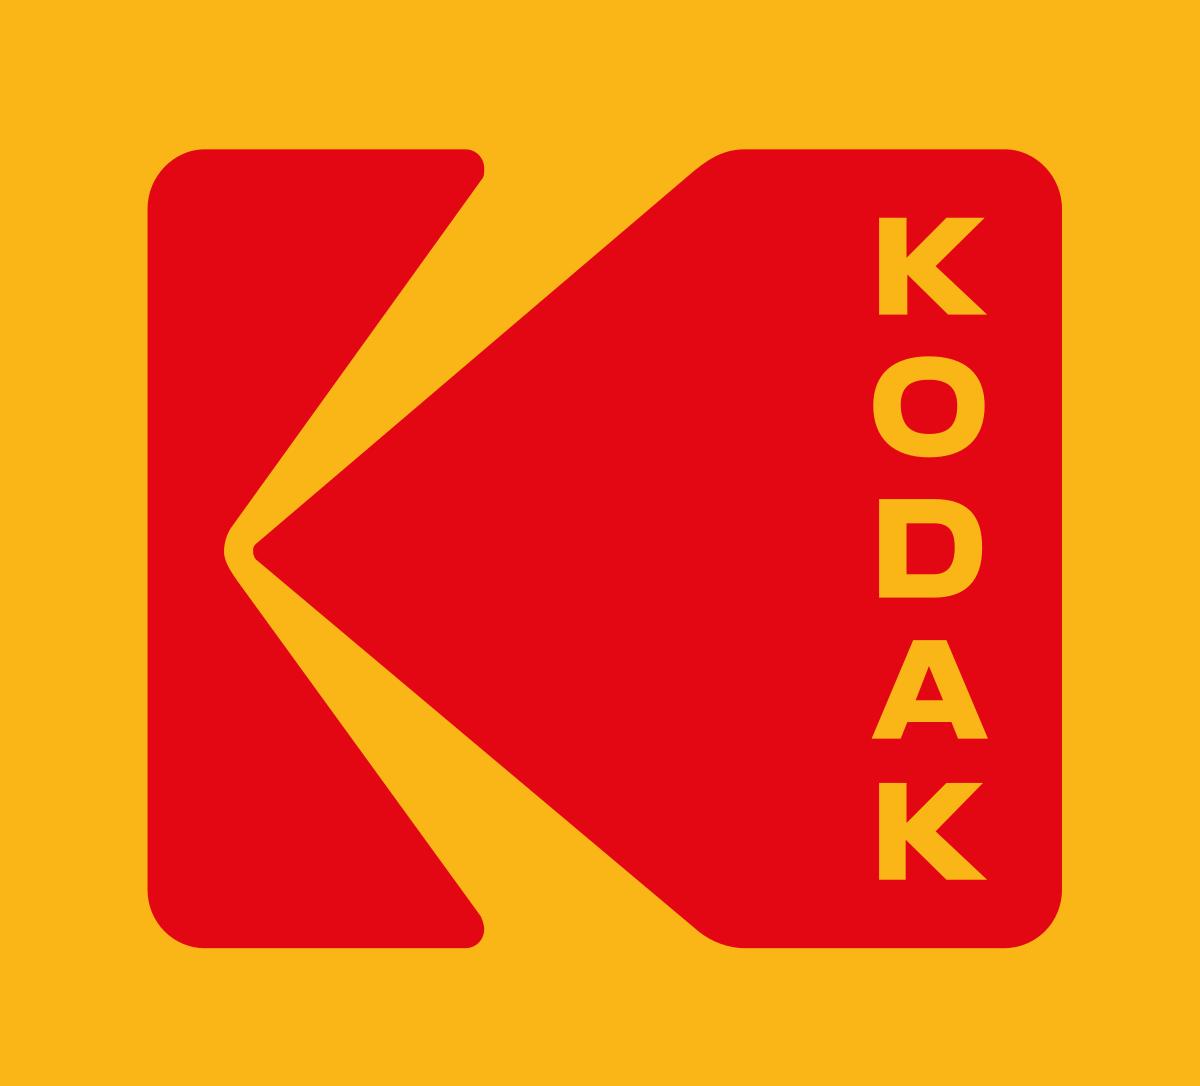 Logo_of_the_Eastman_Kodak_Company.png